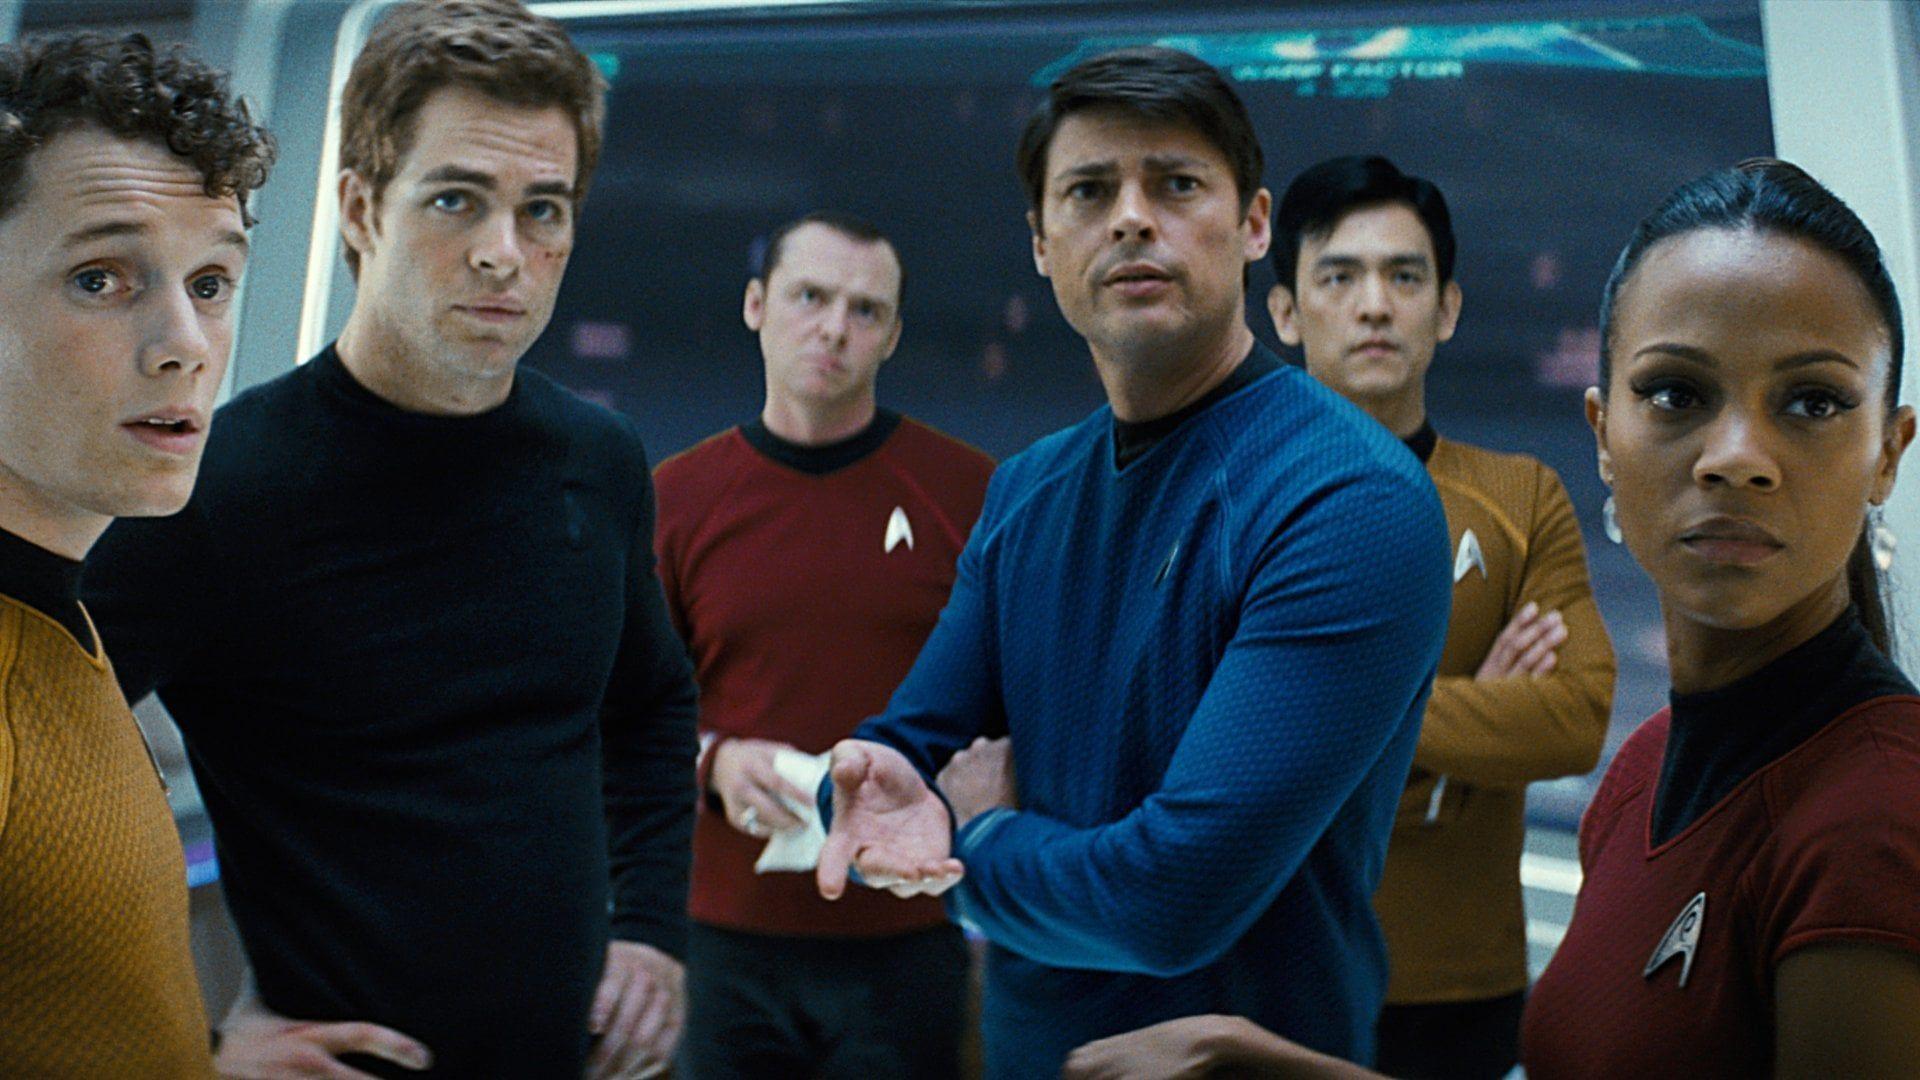 Star Trek 2009 Online Teljes Film Filmek Magyarul Letoltes Hd Star Trek 2009 Teljes Film Magyarul Online Hd Star Trek 2009 Teljes Film Magy Star Trek Iowa Film